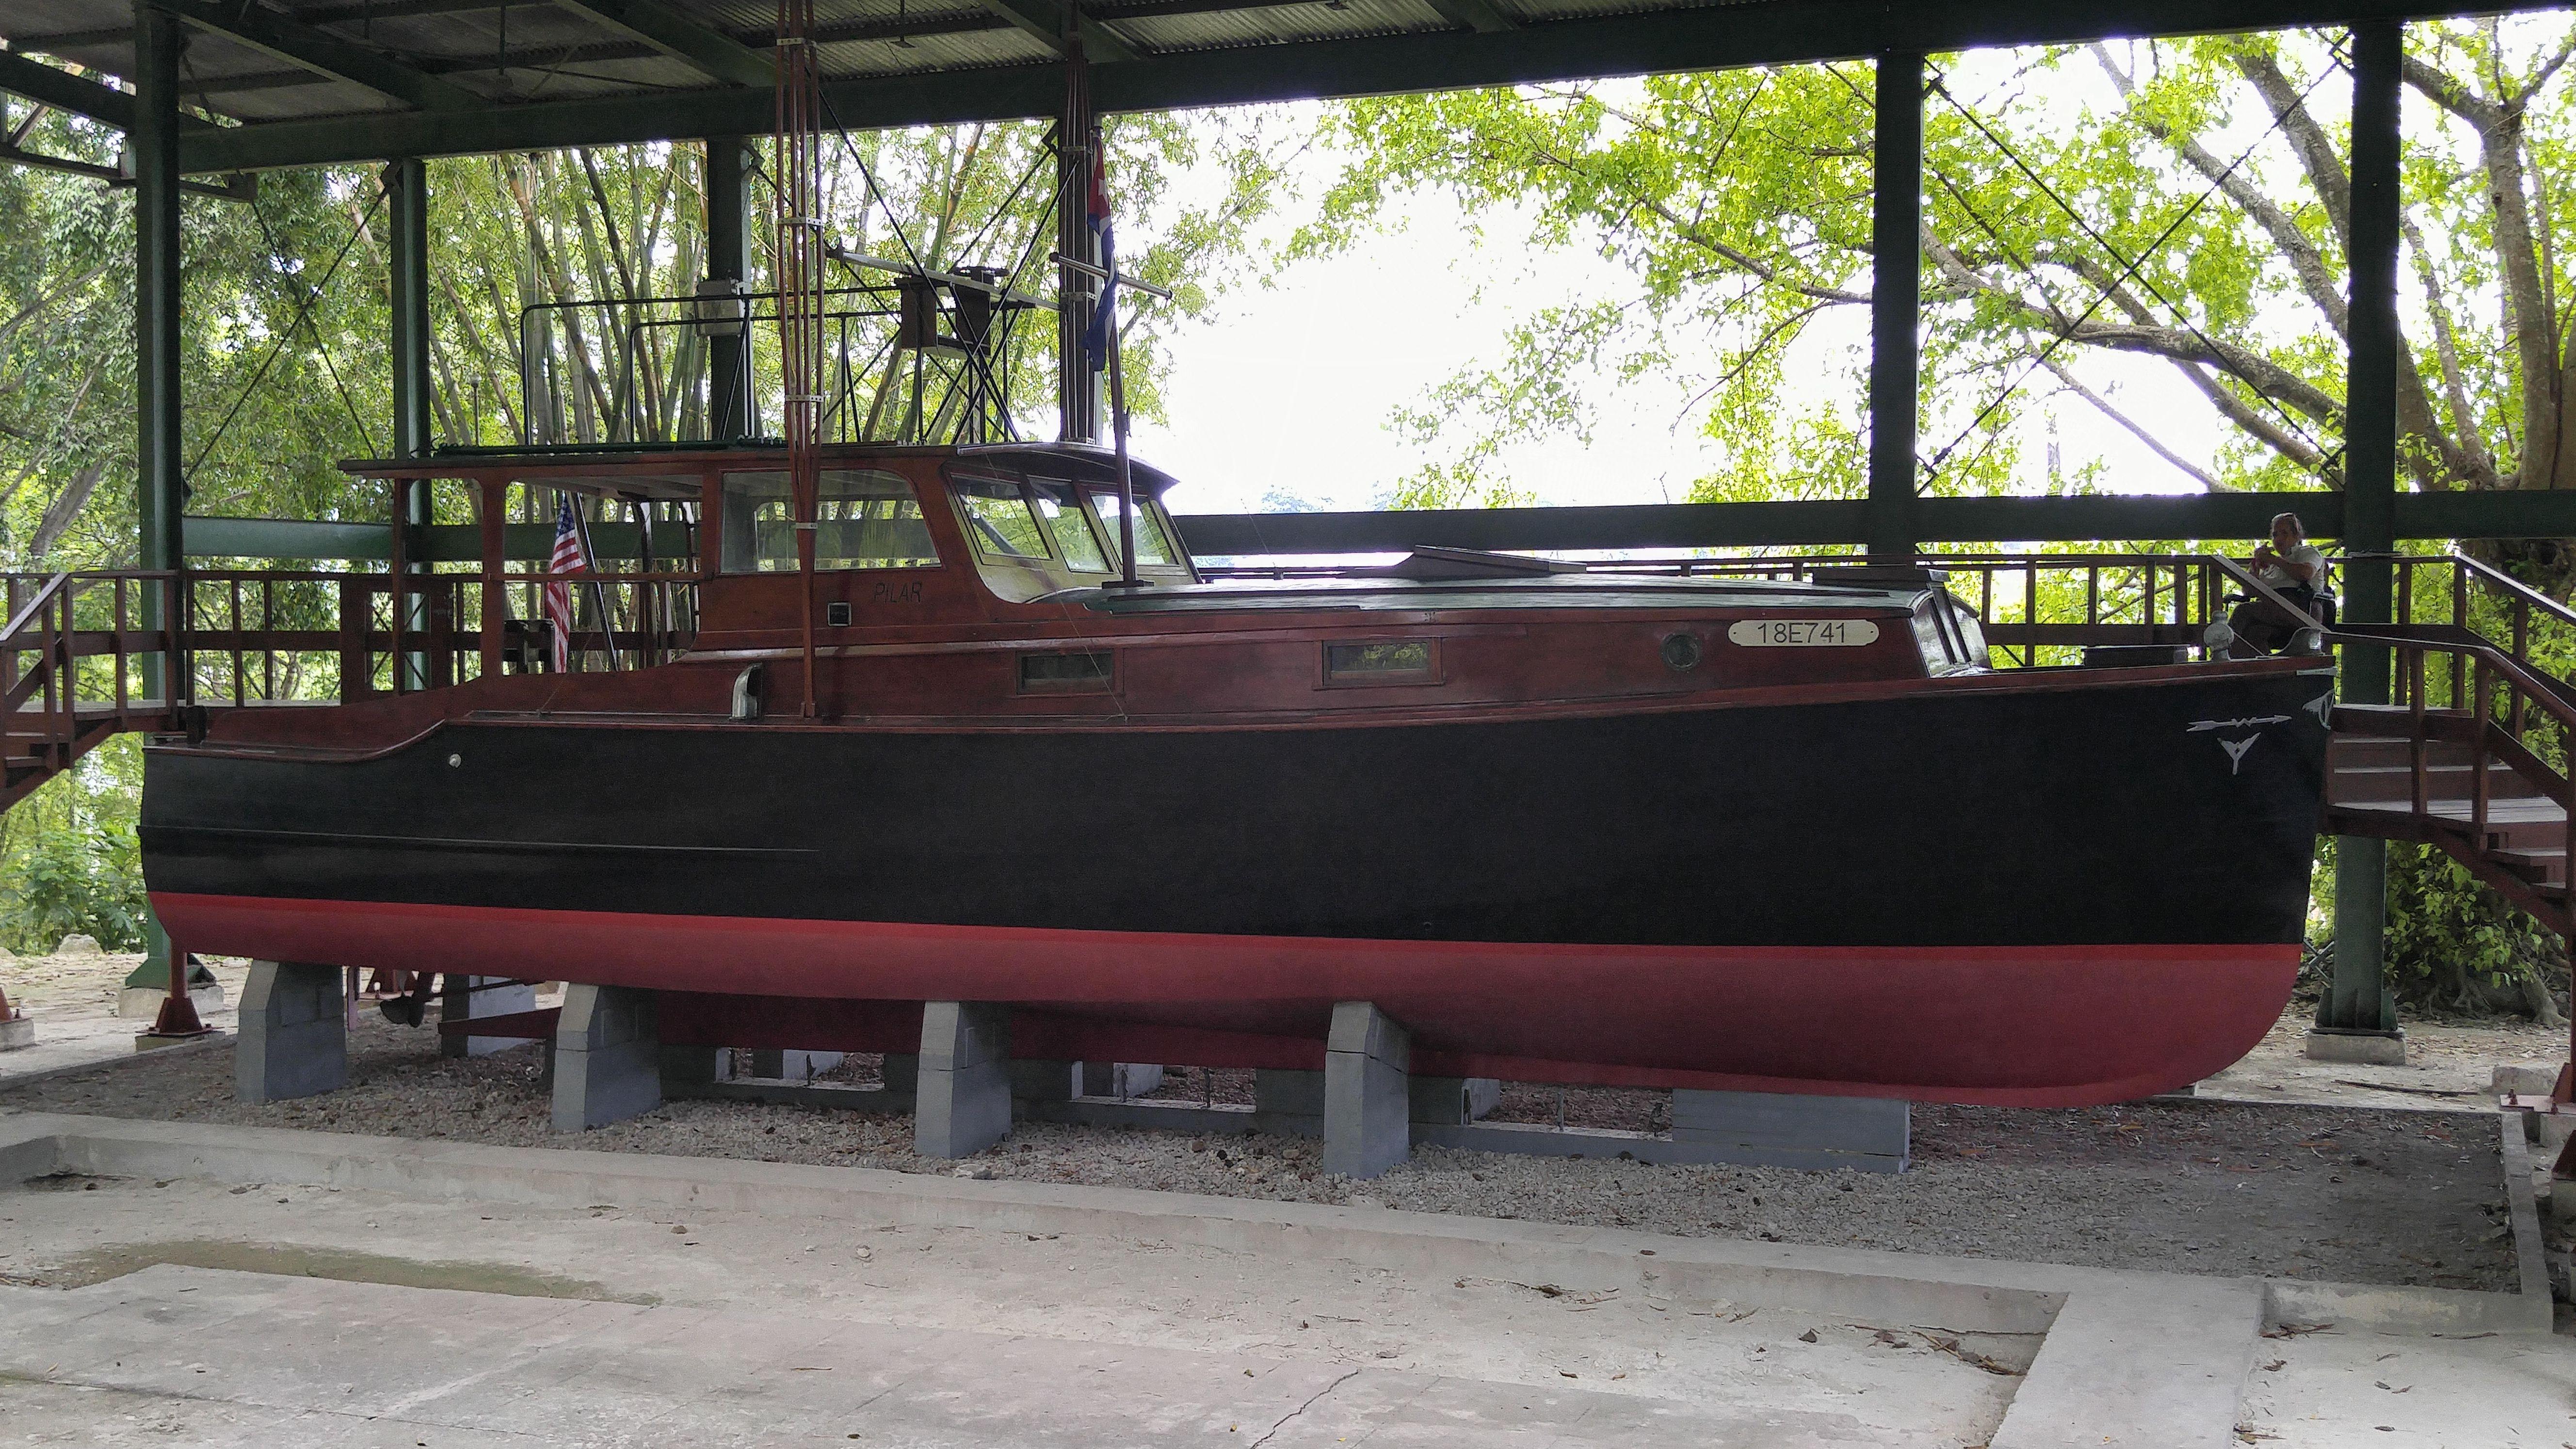 Ernest Hemmingway S Boat Key West Cuba Travel Luxury Travel Travel Agency